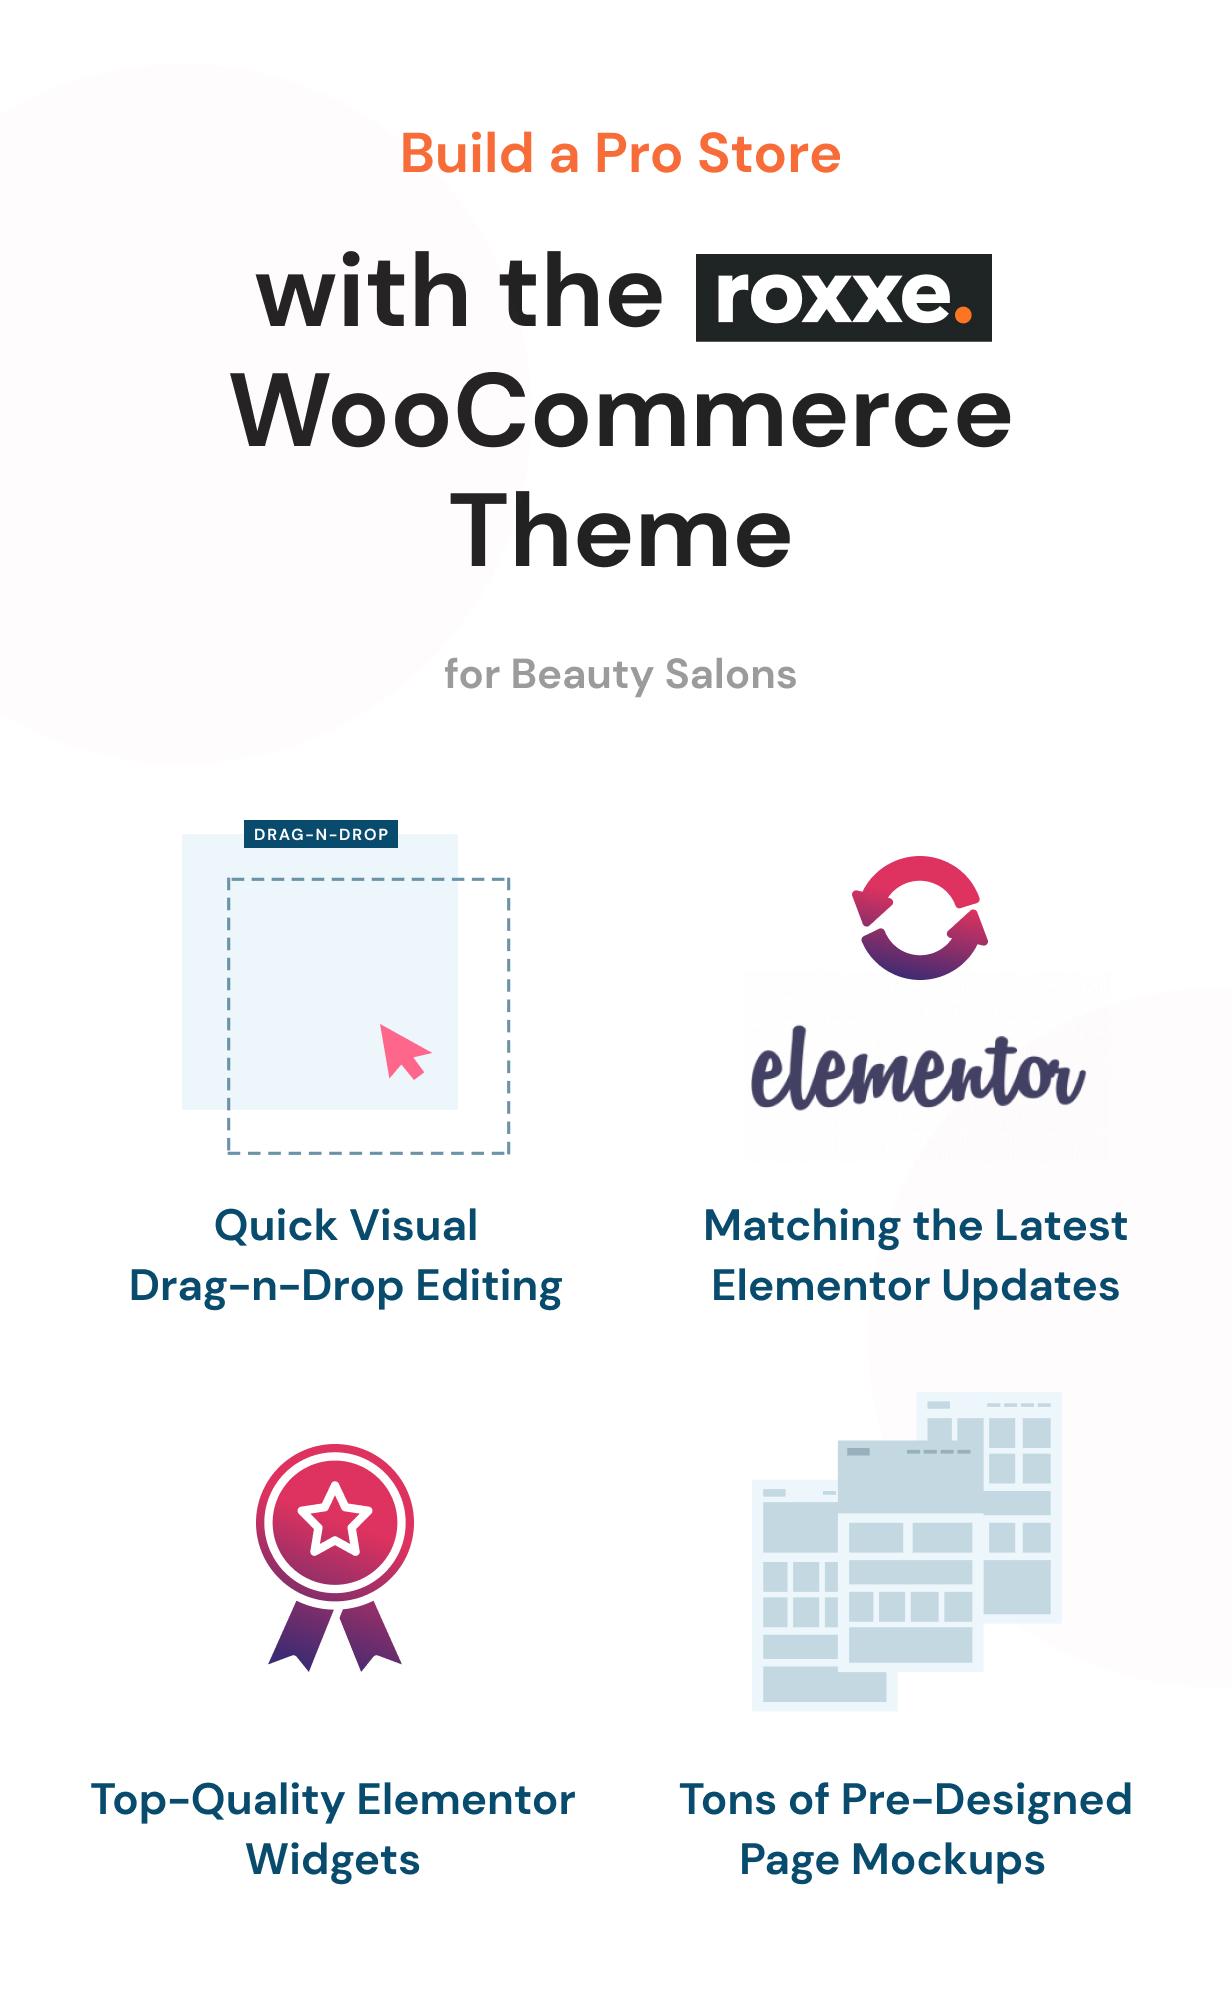 Beauty Salon WooCommerce Theme